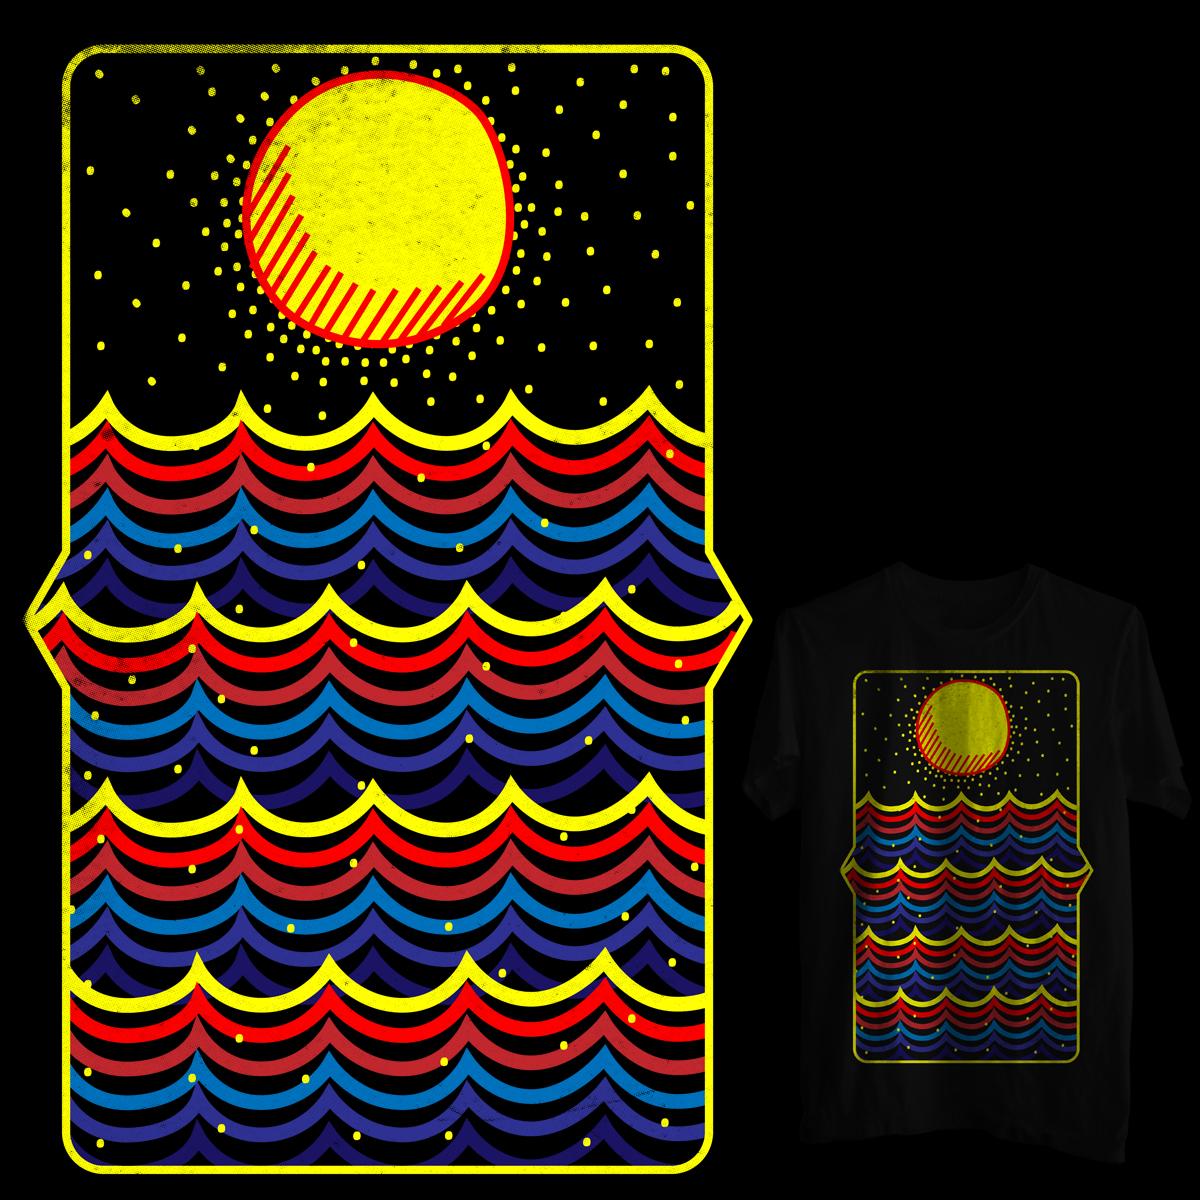 Imaginary sun by ndough on Threadless